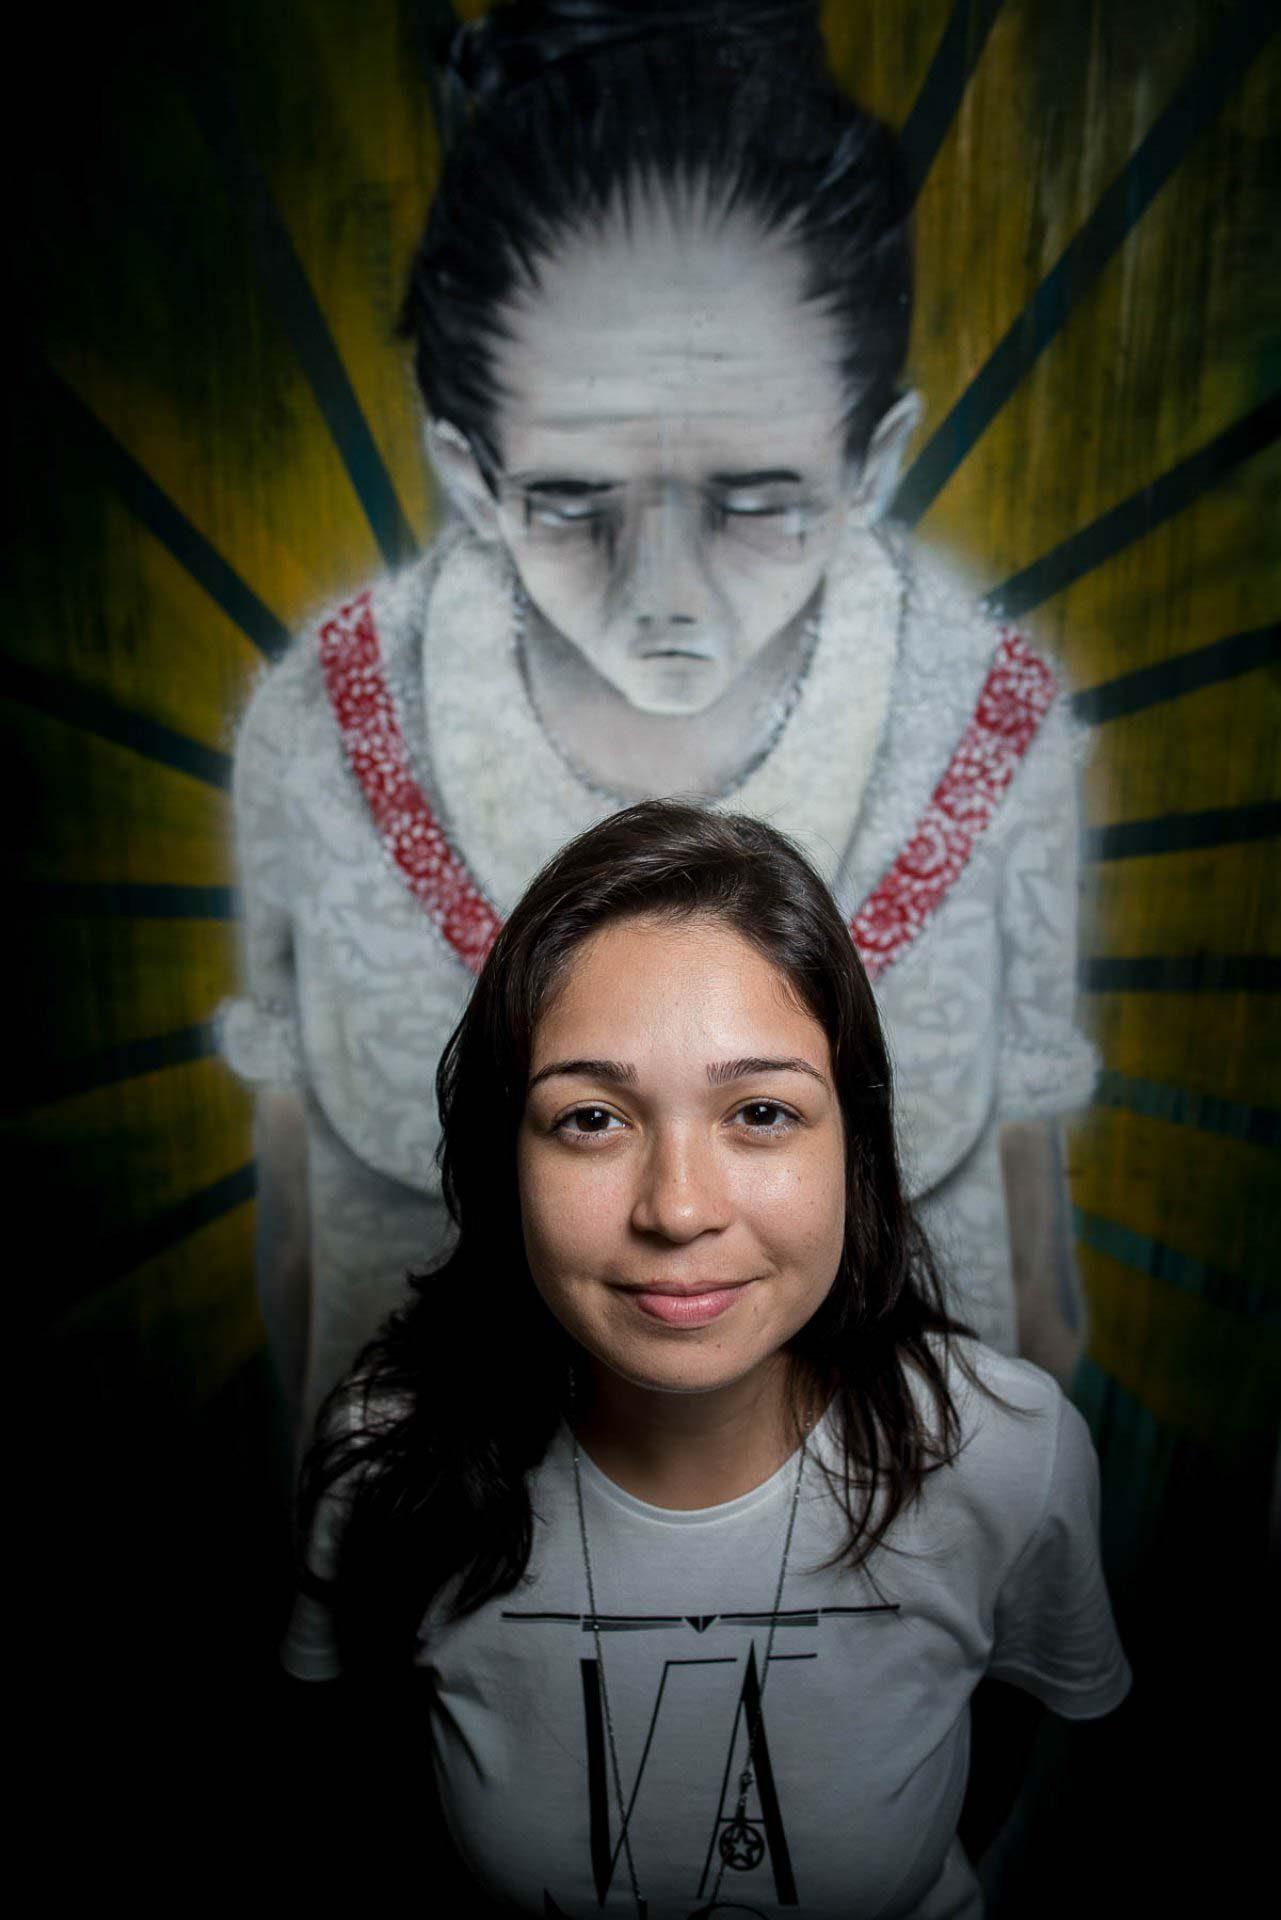 A artista grafiteira - Drika Chagas